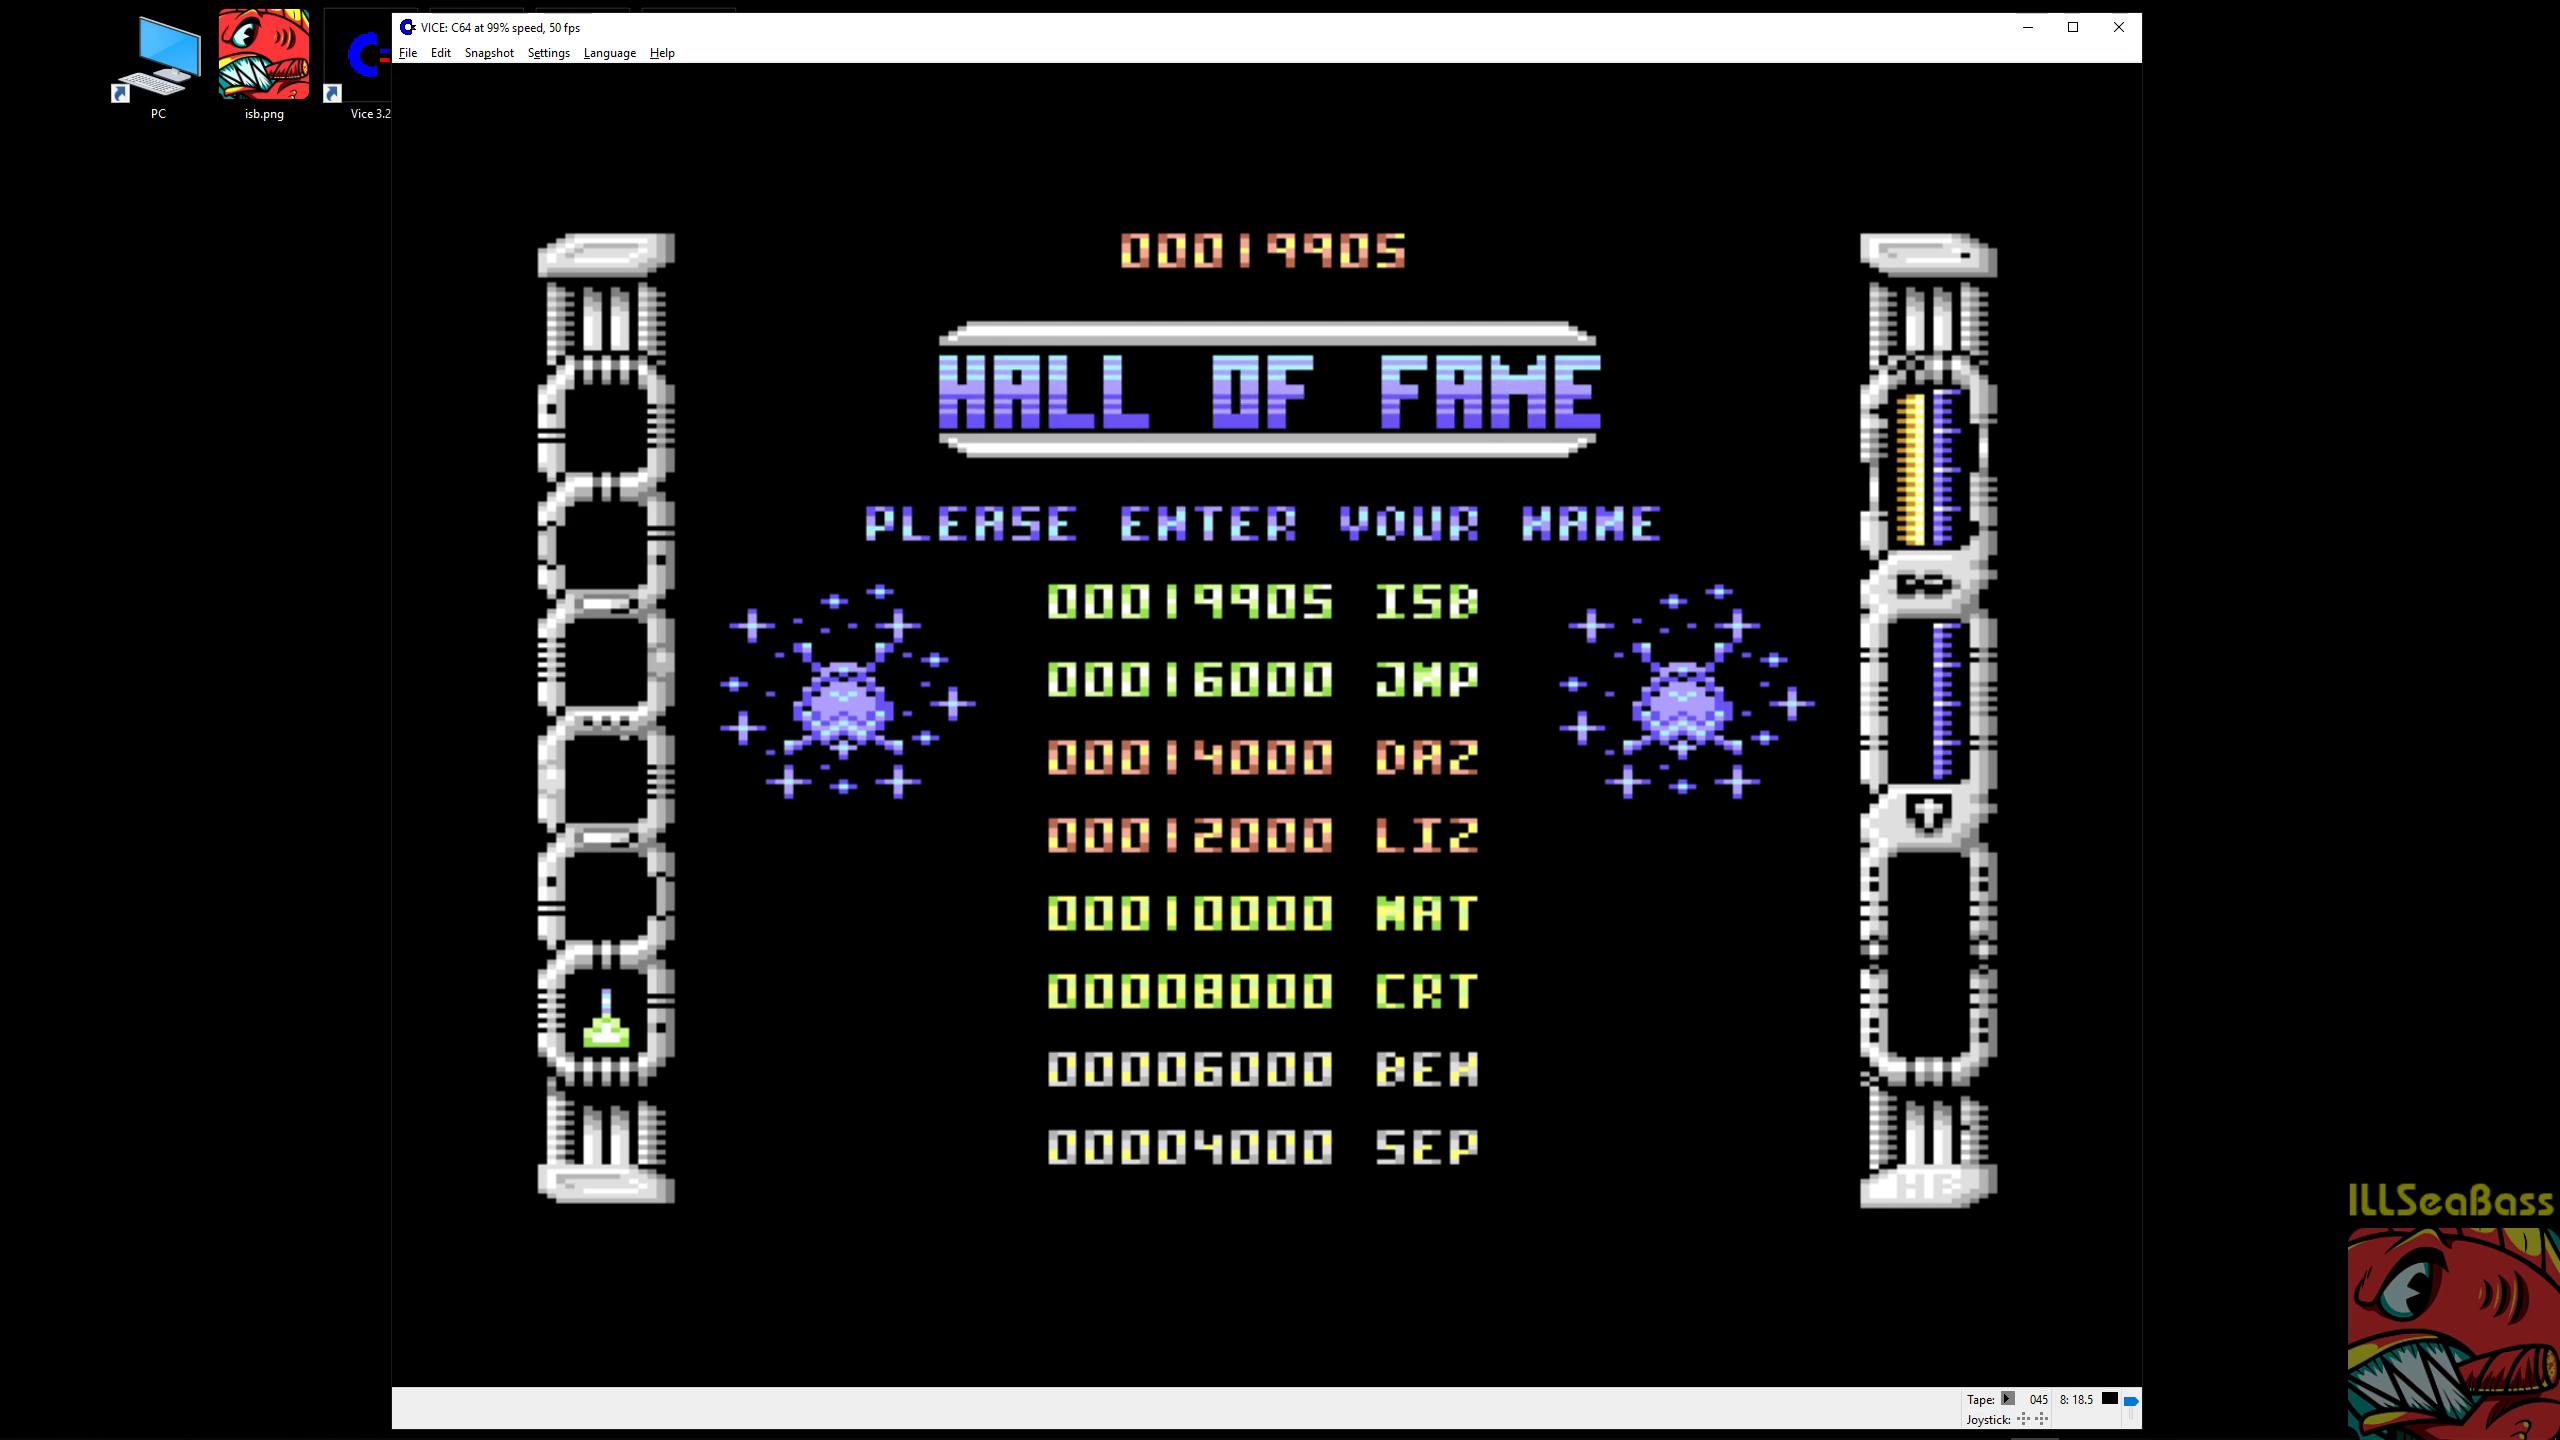 ILLSeaBass: Eliminator [Hewson] (Commodore 64 Emulated) 19,905 points on 2019-02-25 08:47:51